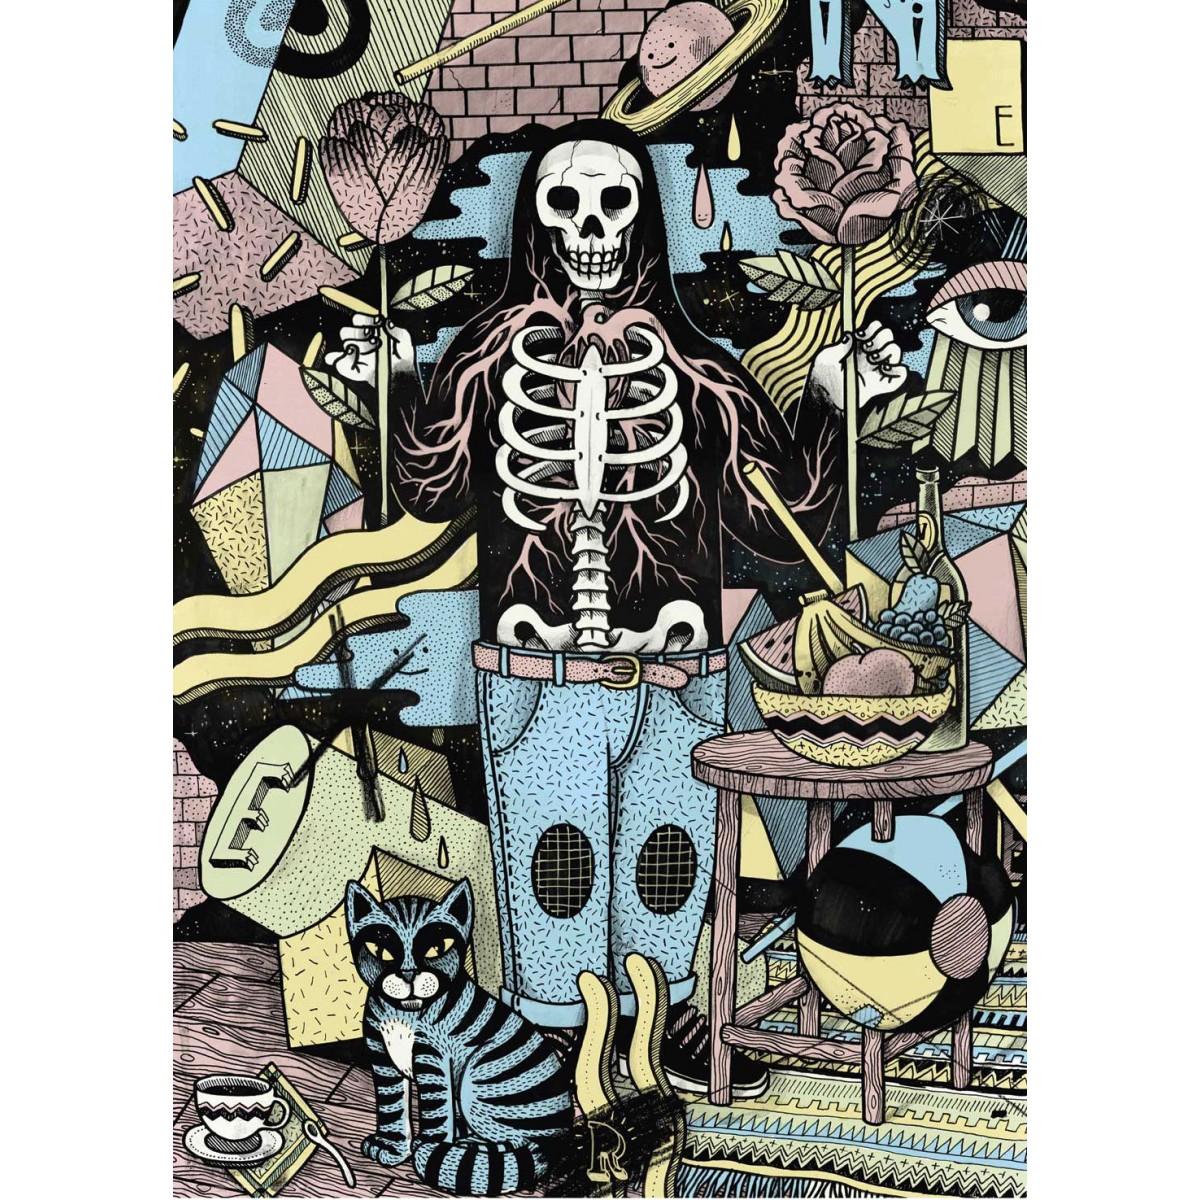 Poster »Kater Gothics« 50x70cm, Illustration von Martin Krusche